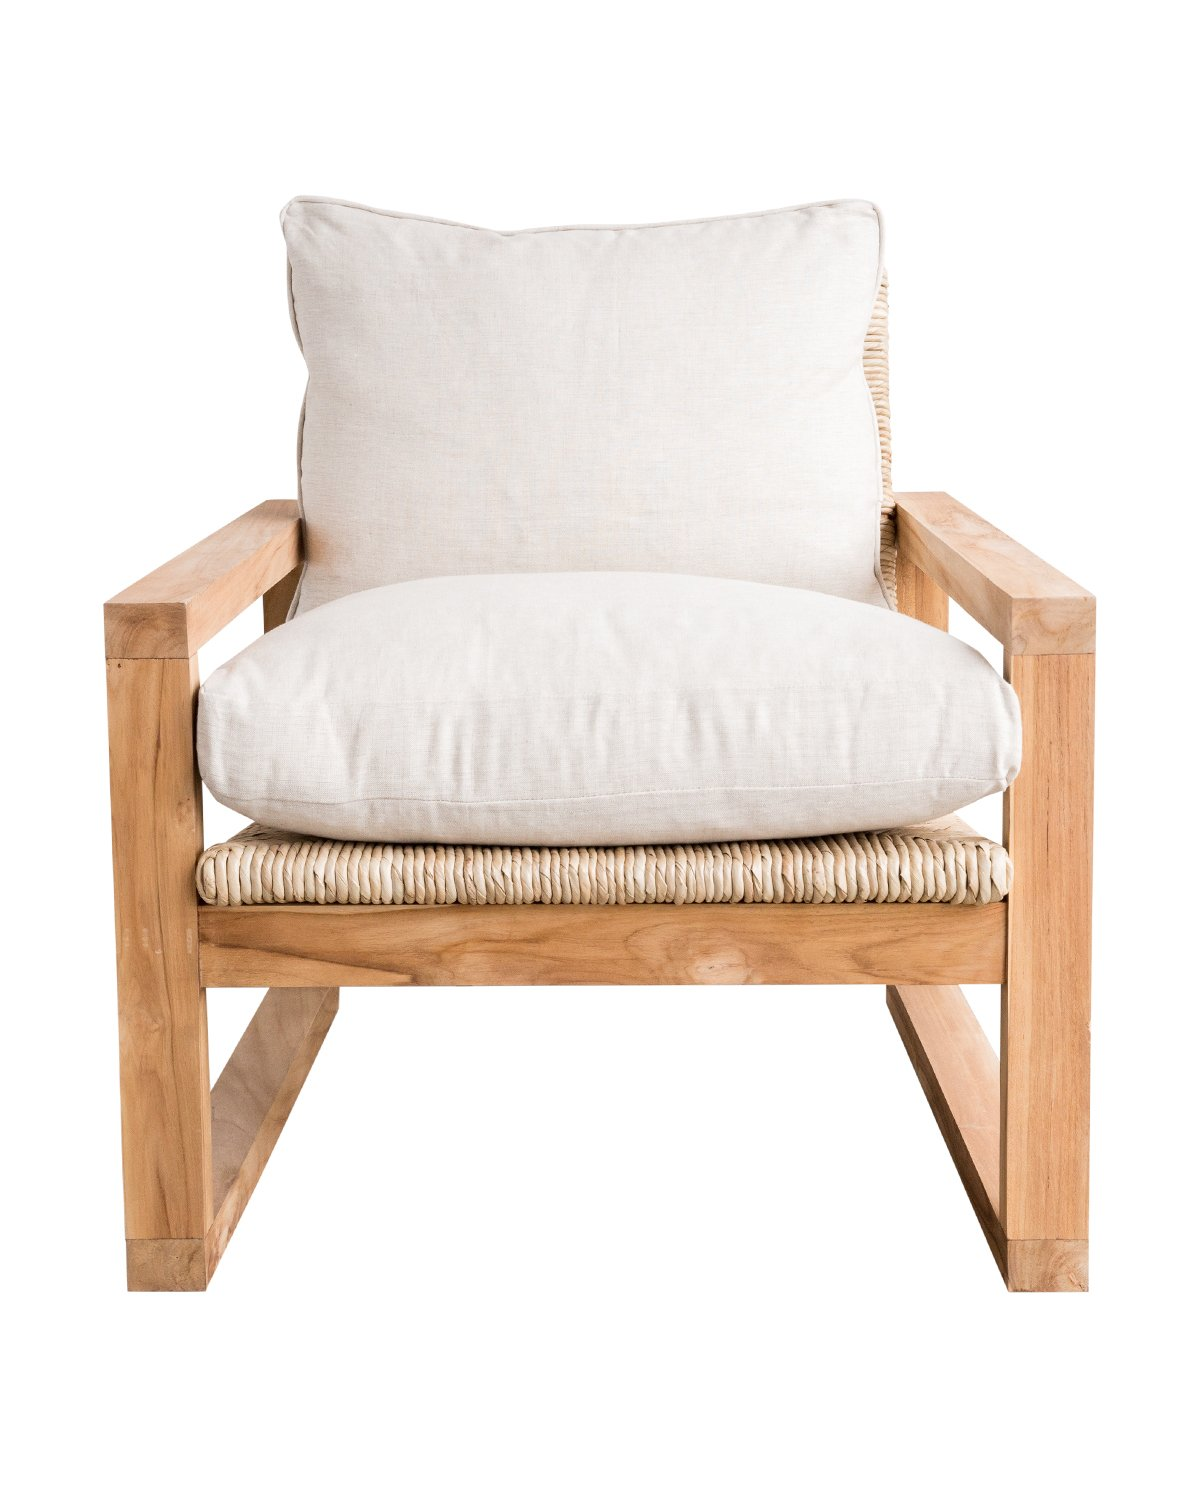 Cosette_Chair_1.jpg